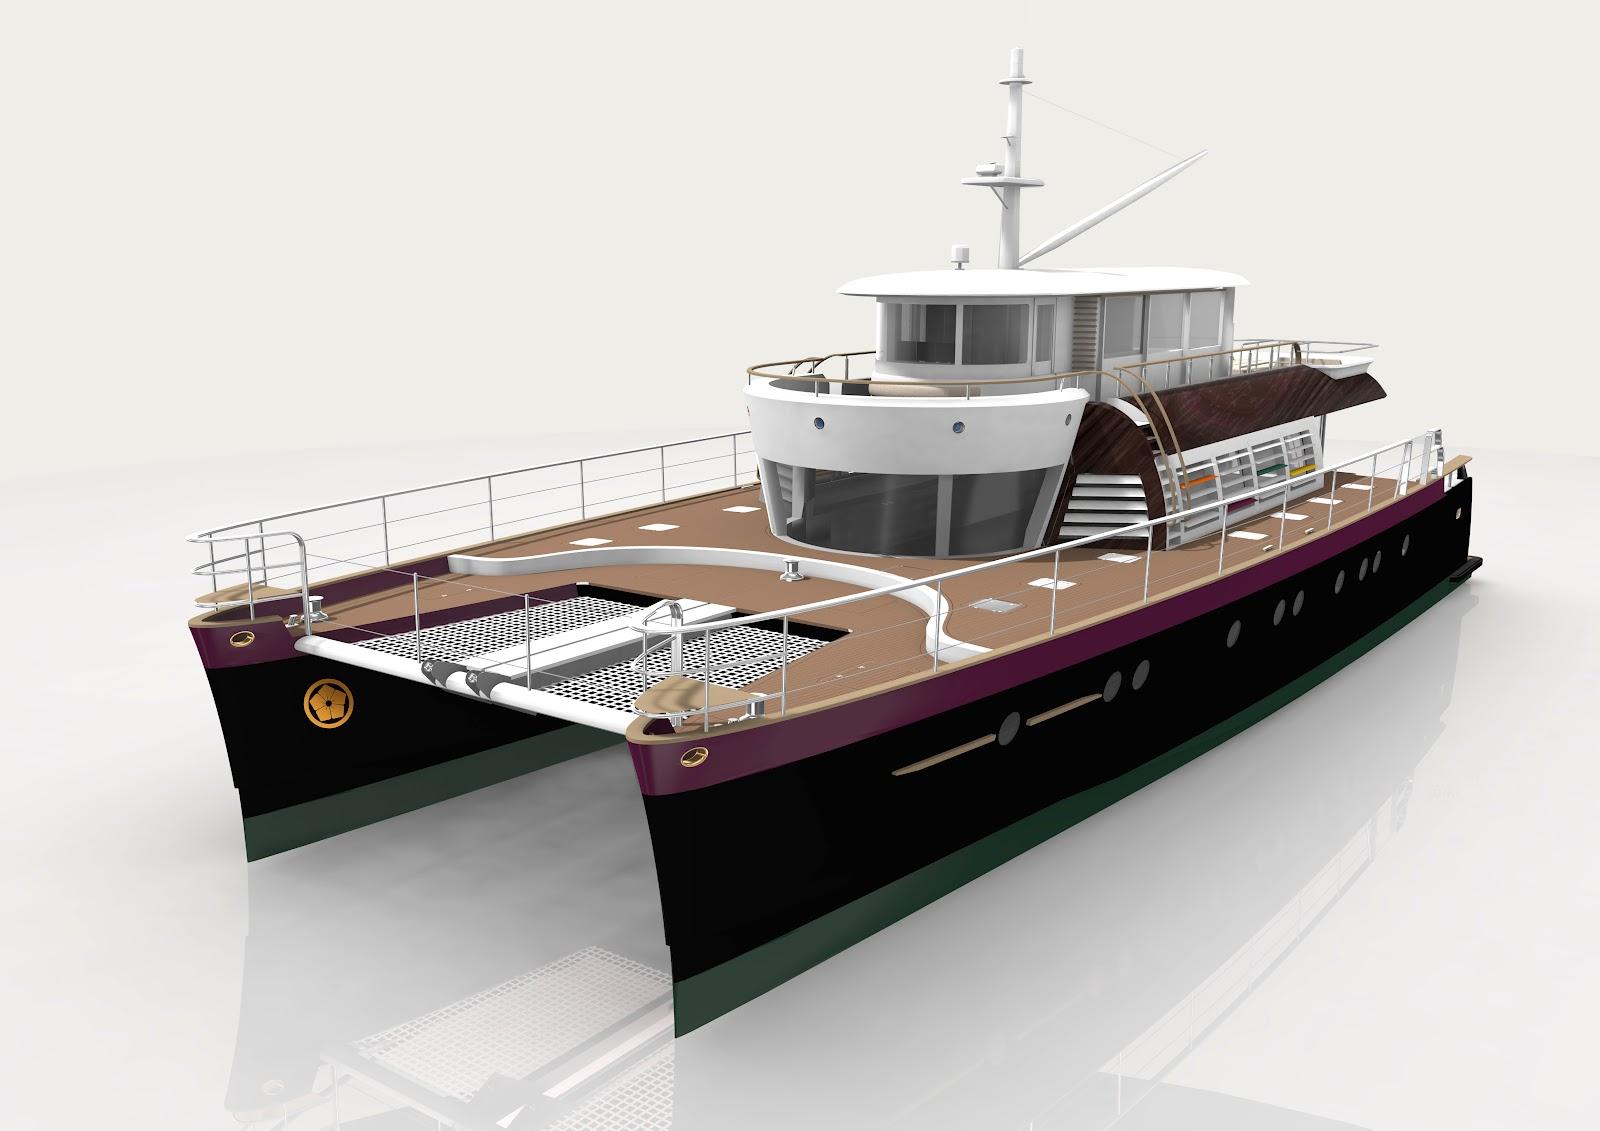 Luxury Catamaran NOAH LUXURY CATAMARAN BY KENZO